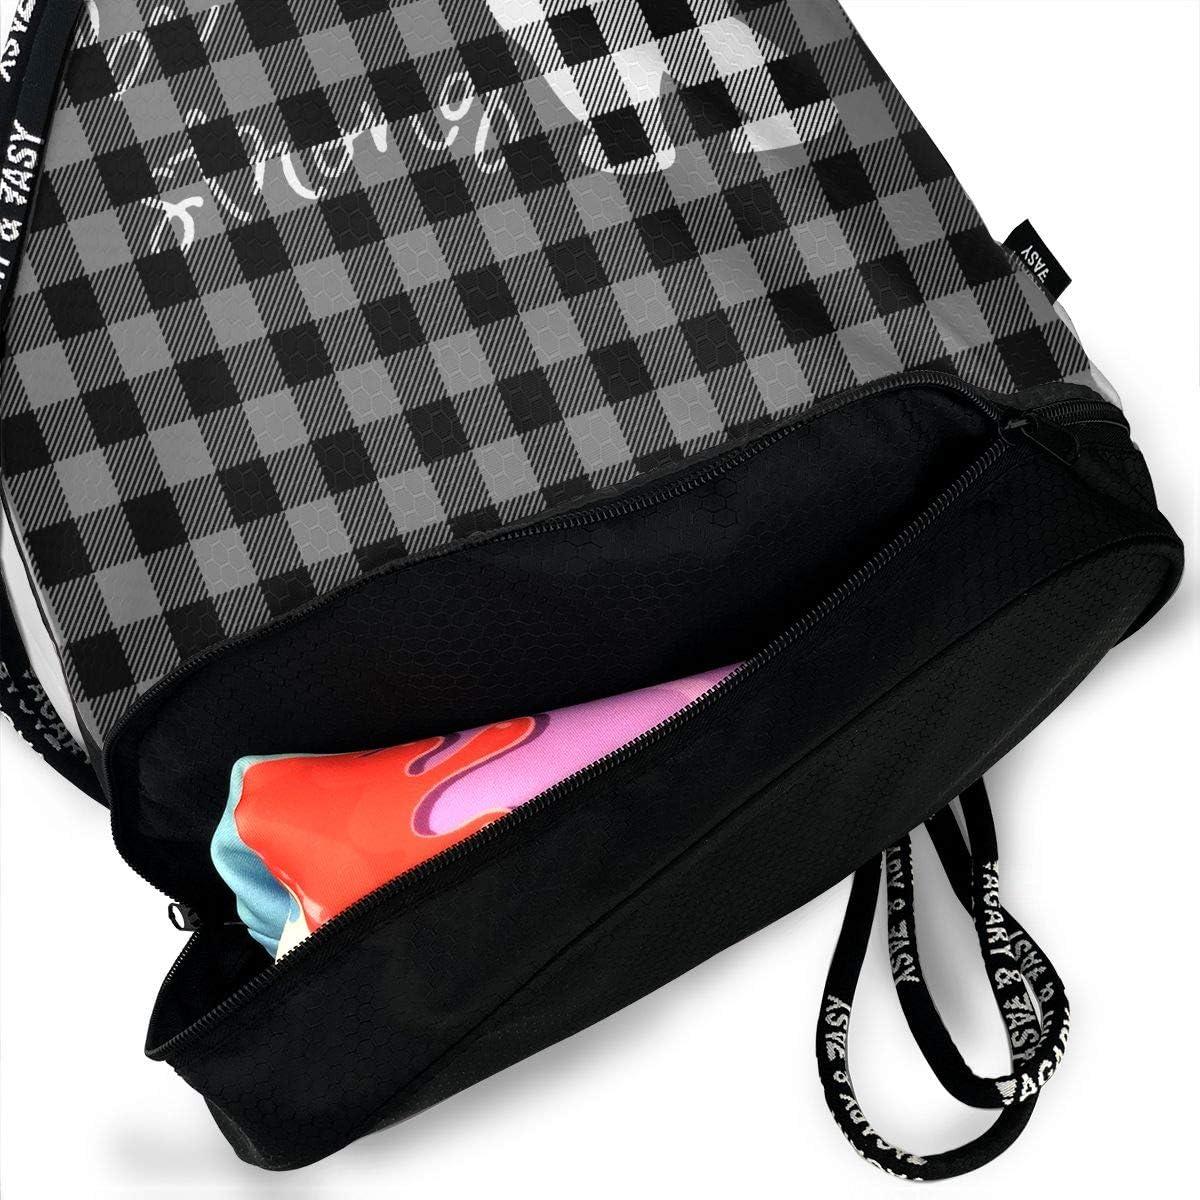 HUOPR5Q Buffalo Plaid Bear Black Gray Drawstring Backpack Sport Gym Sack Shoulder Bulk Bag Dance Bag for School Travel